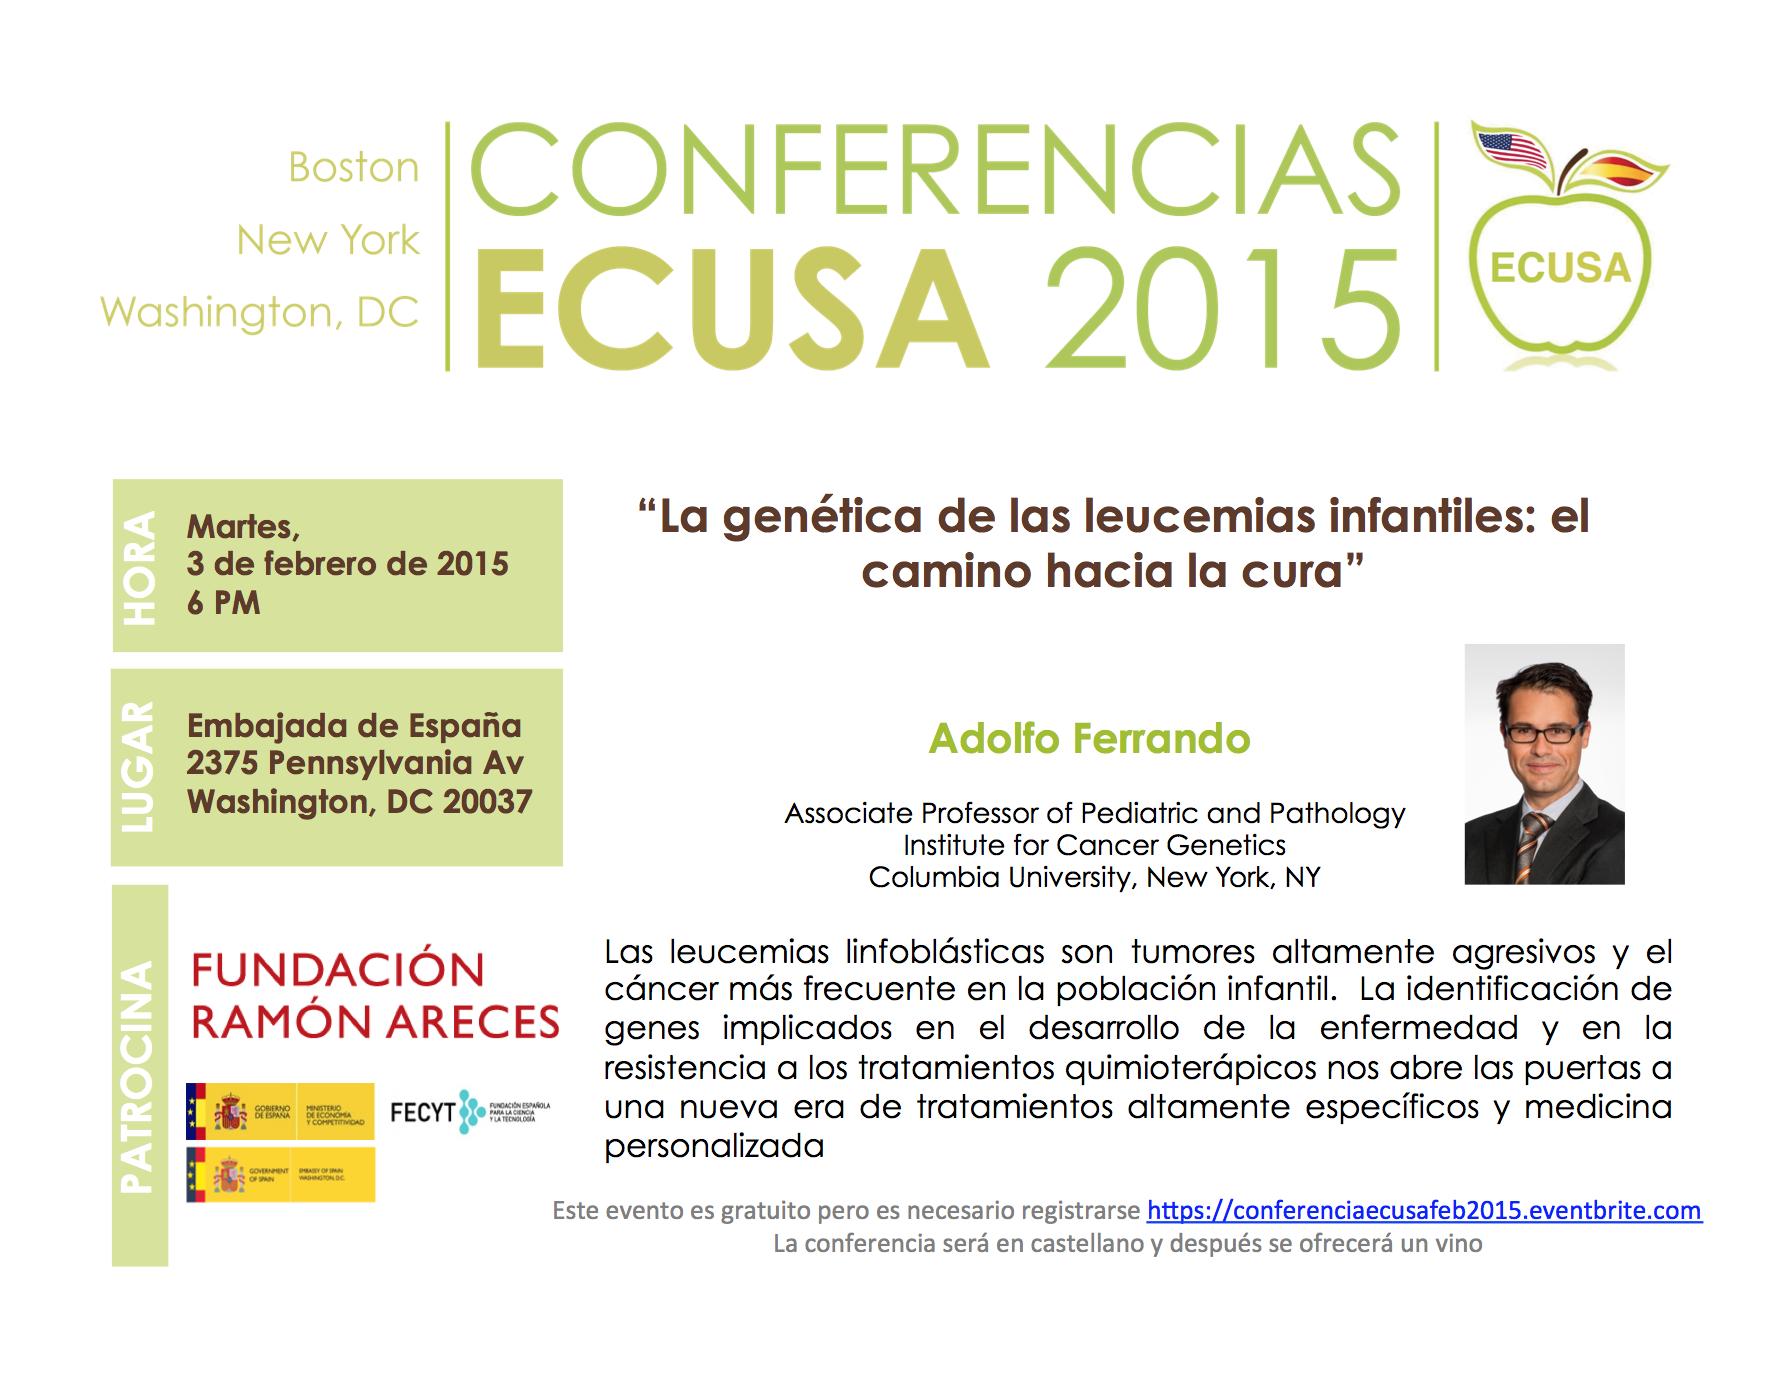 conferencias_2015_adolfo_ferrando.png